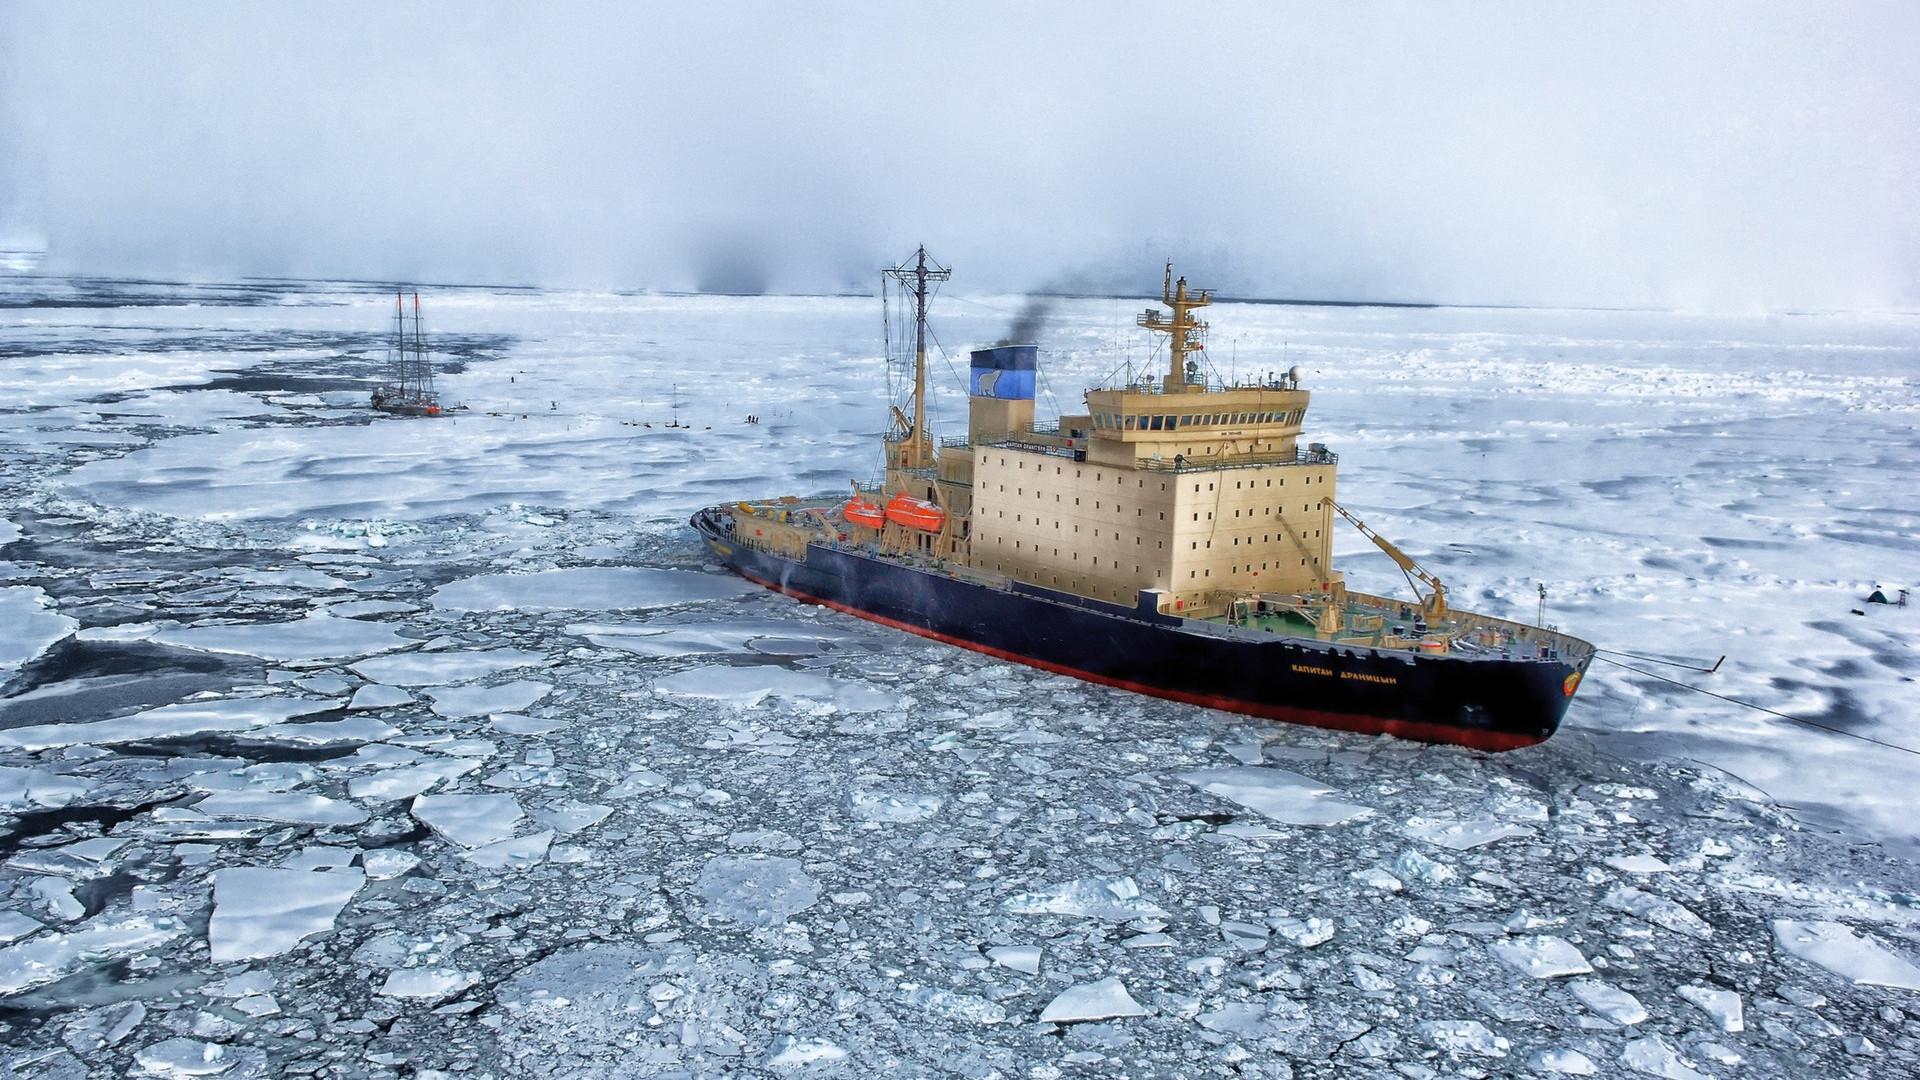 cold-snow-sea-landscape-69406 (1).jpg